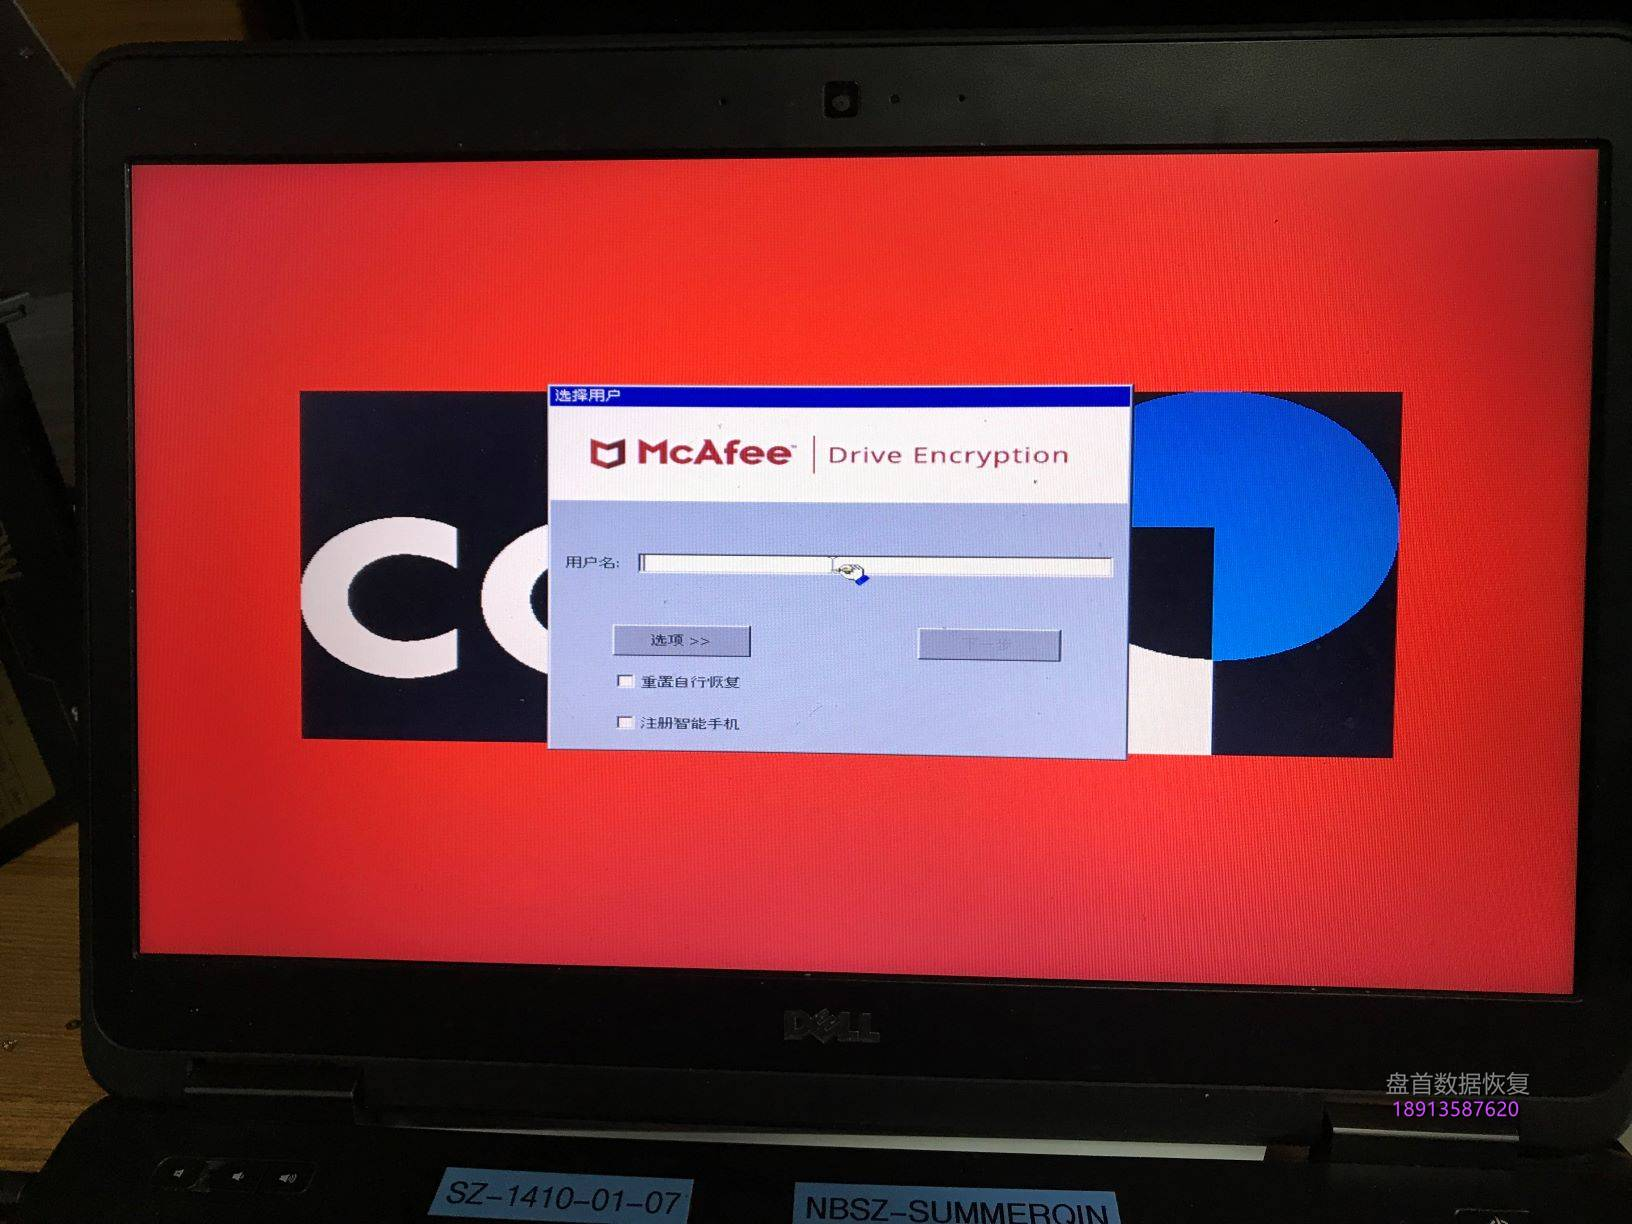 0-29 ST500LT012开盘数据恢复McAfee Drive Encryption磁盘加密数据恢复完美成功